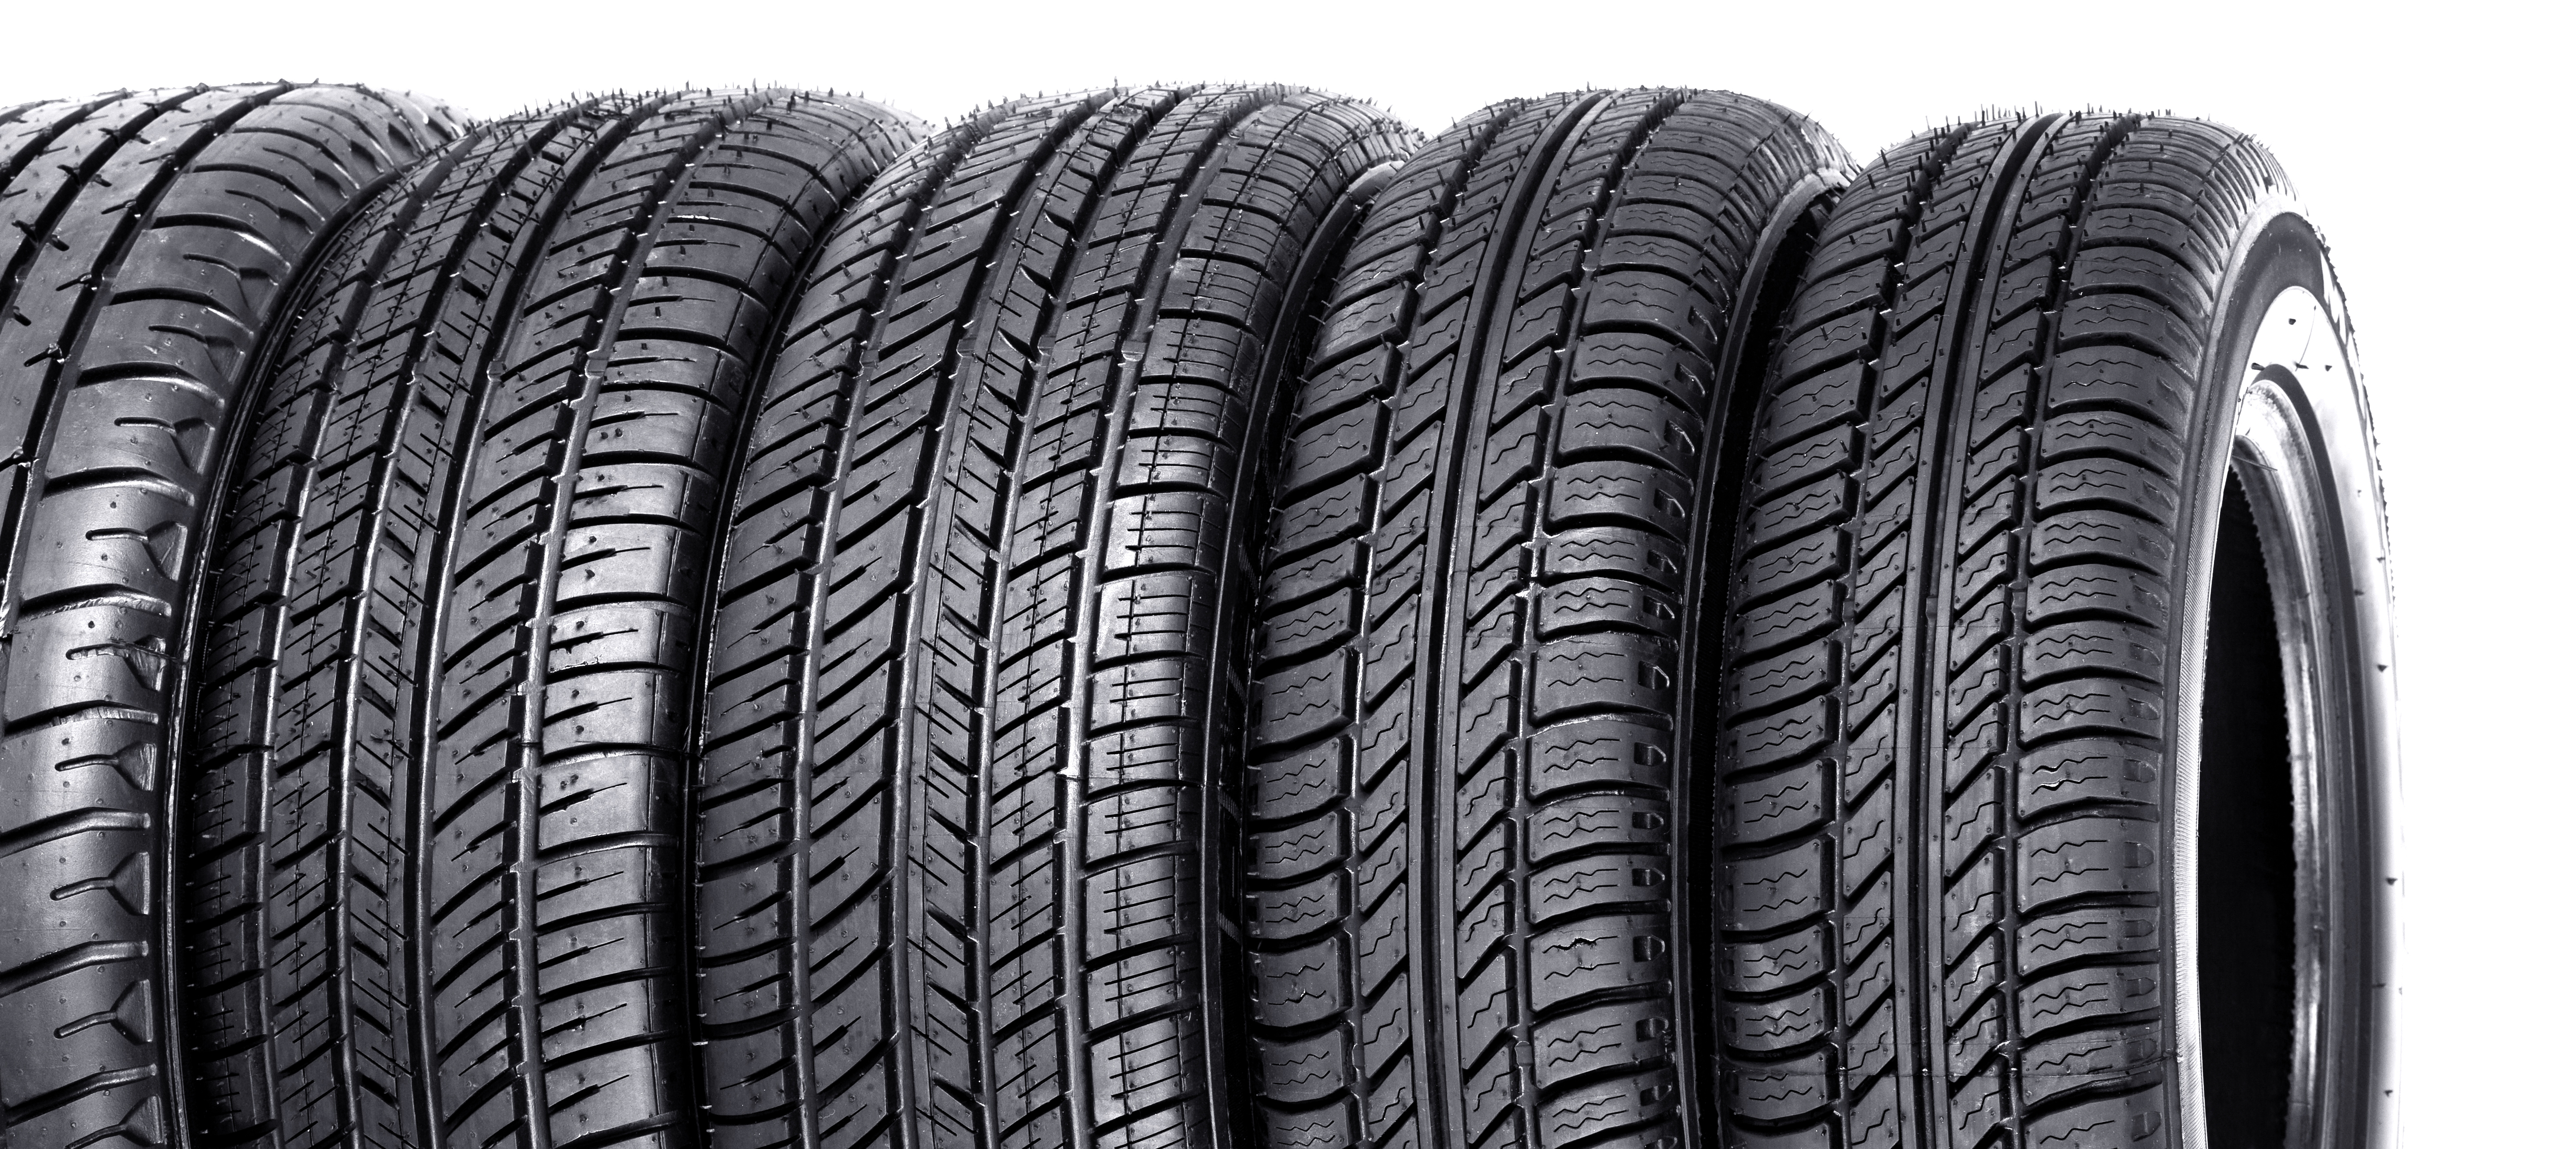 cleveland collision blog why should i rotate my tires. Black Bedroom Furniture Sets. Home Design Ideas